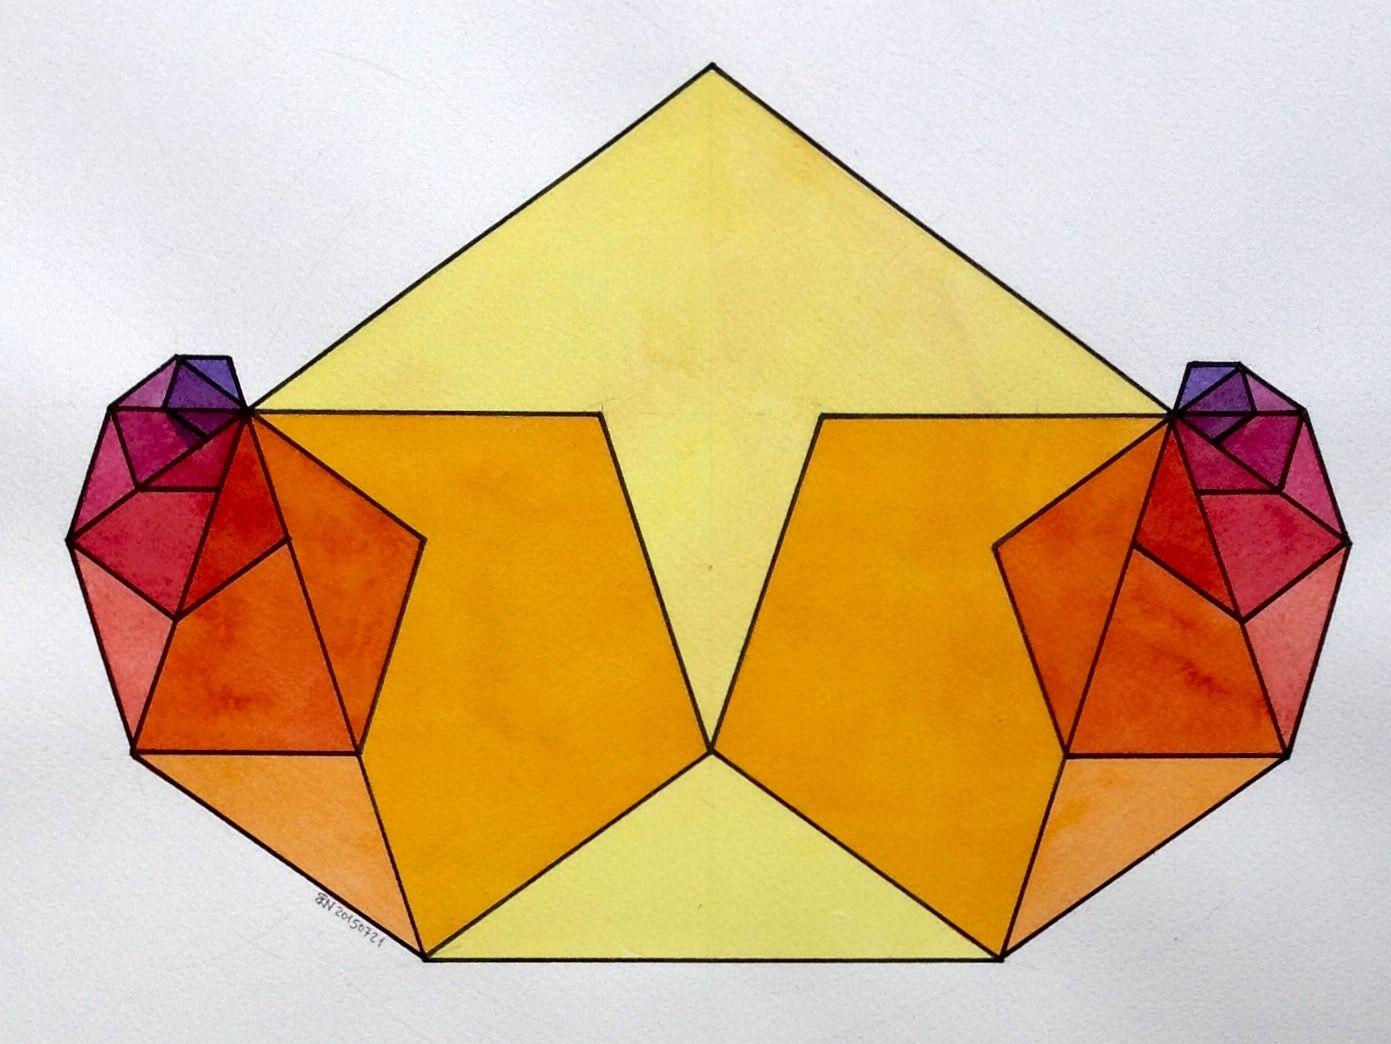 #regolo54 #Fractal #Fibonacci #geometry #symmetry #pattern #math #Escher #Art #warercolor #handmade